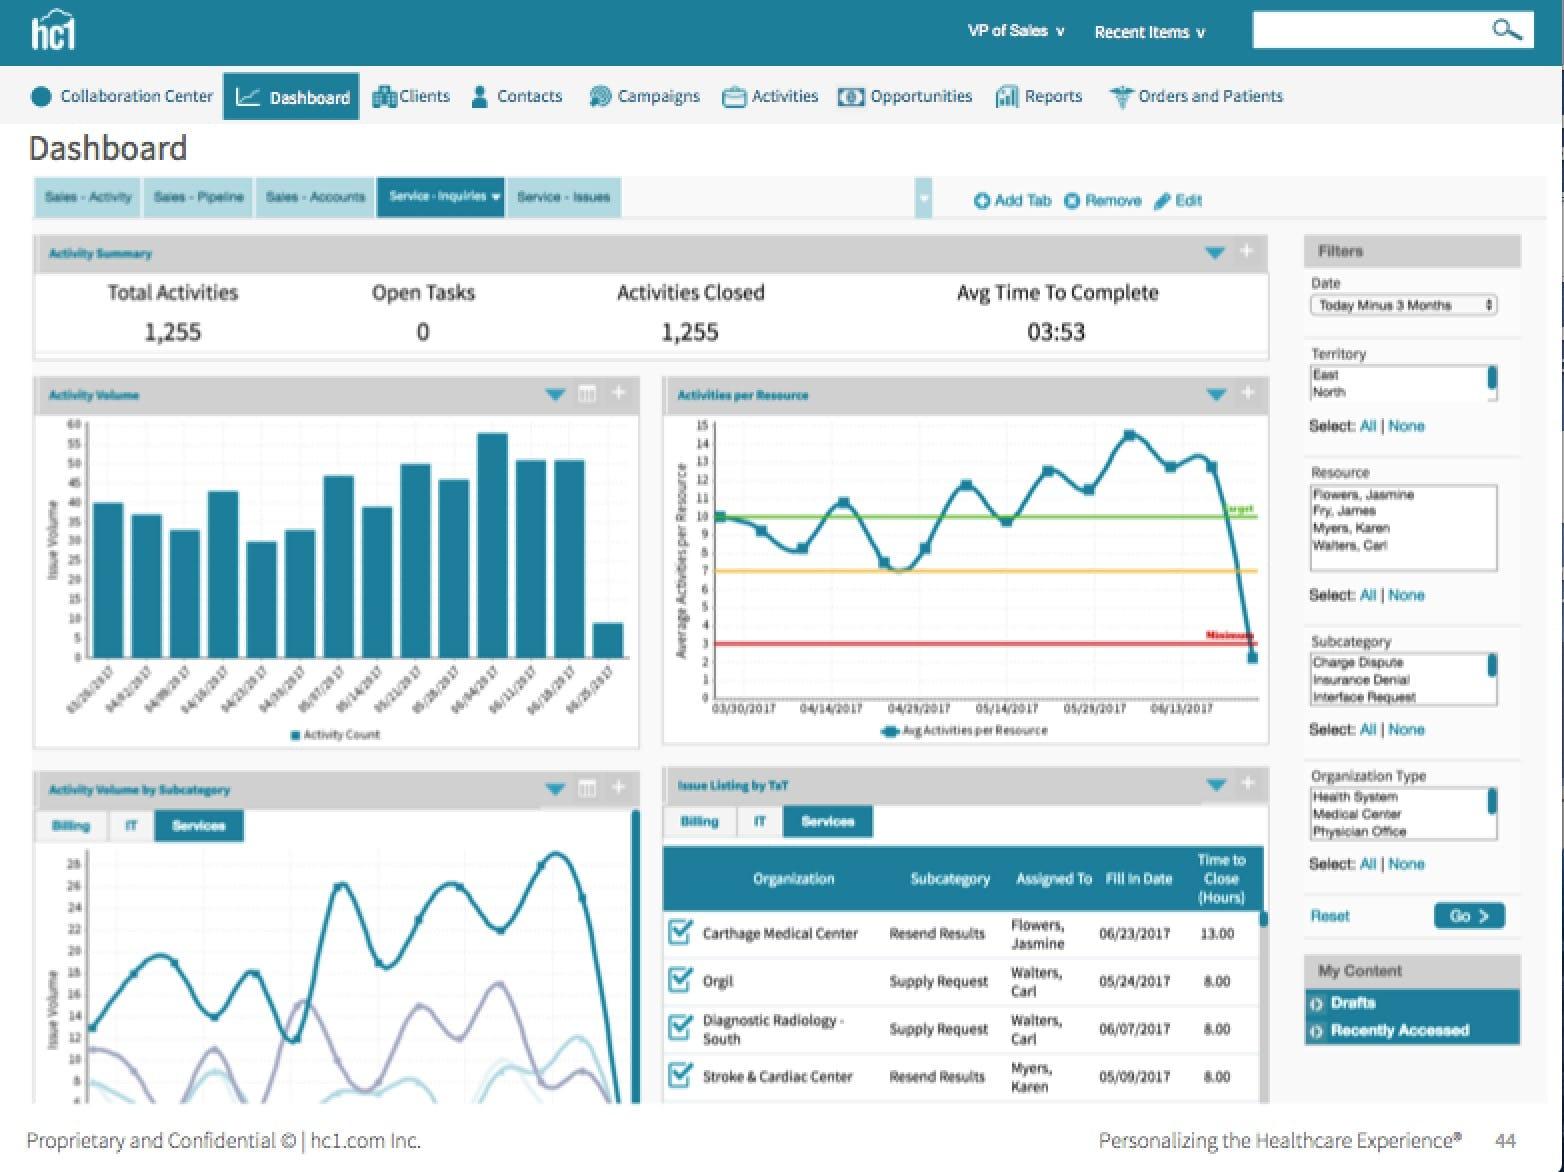 hc1 High-Value Care Platform Software - Service activity volume %>